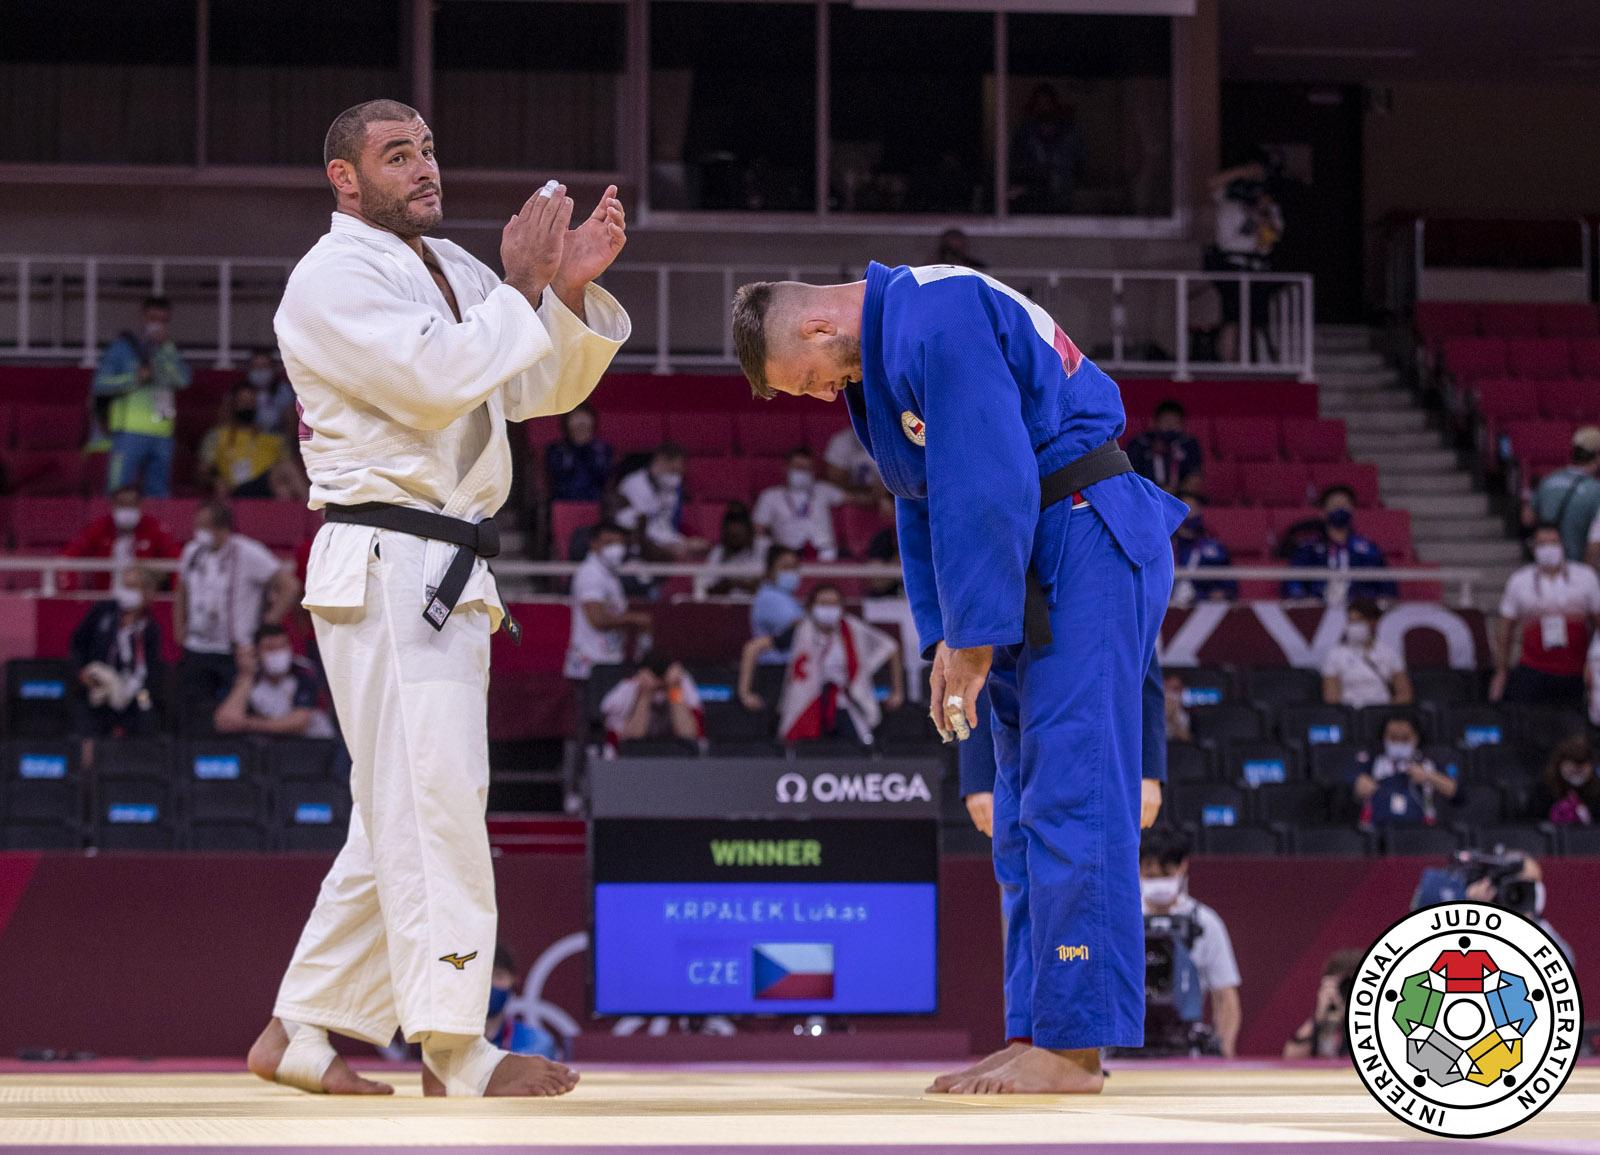 2021-olympijske-hry-tokio-judo-krpalek-web-2